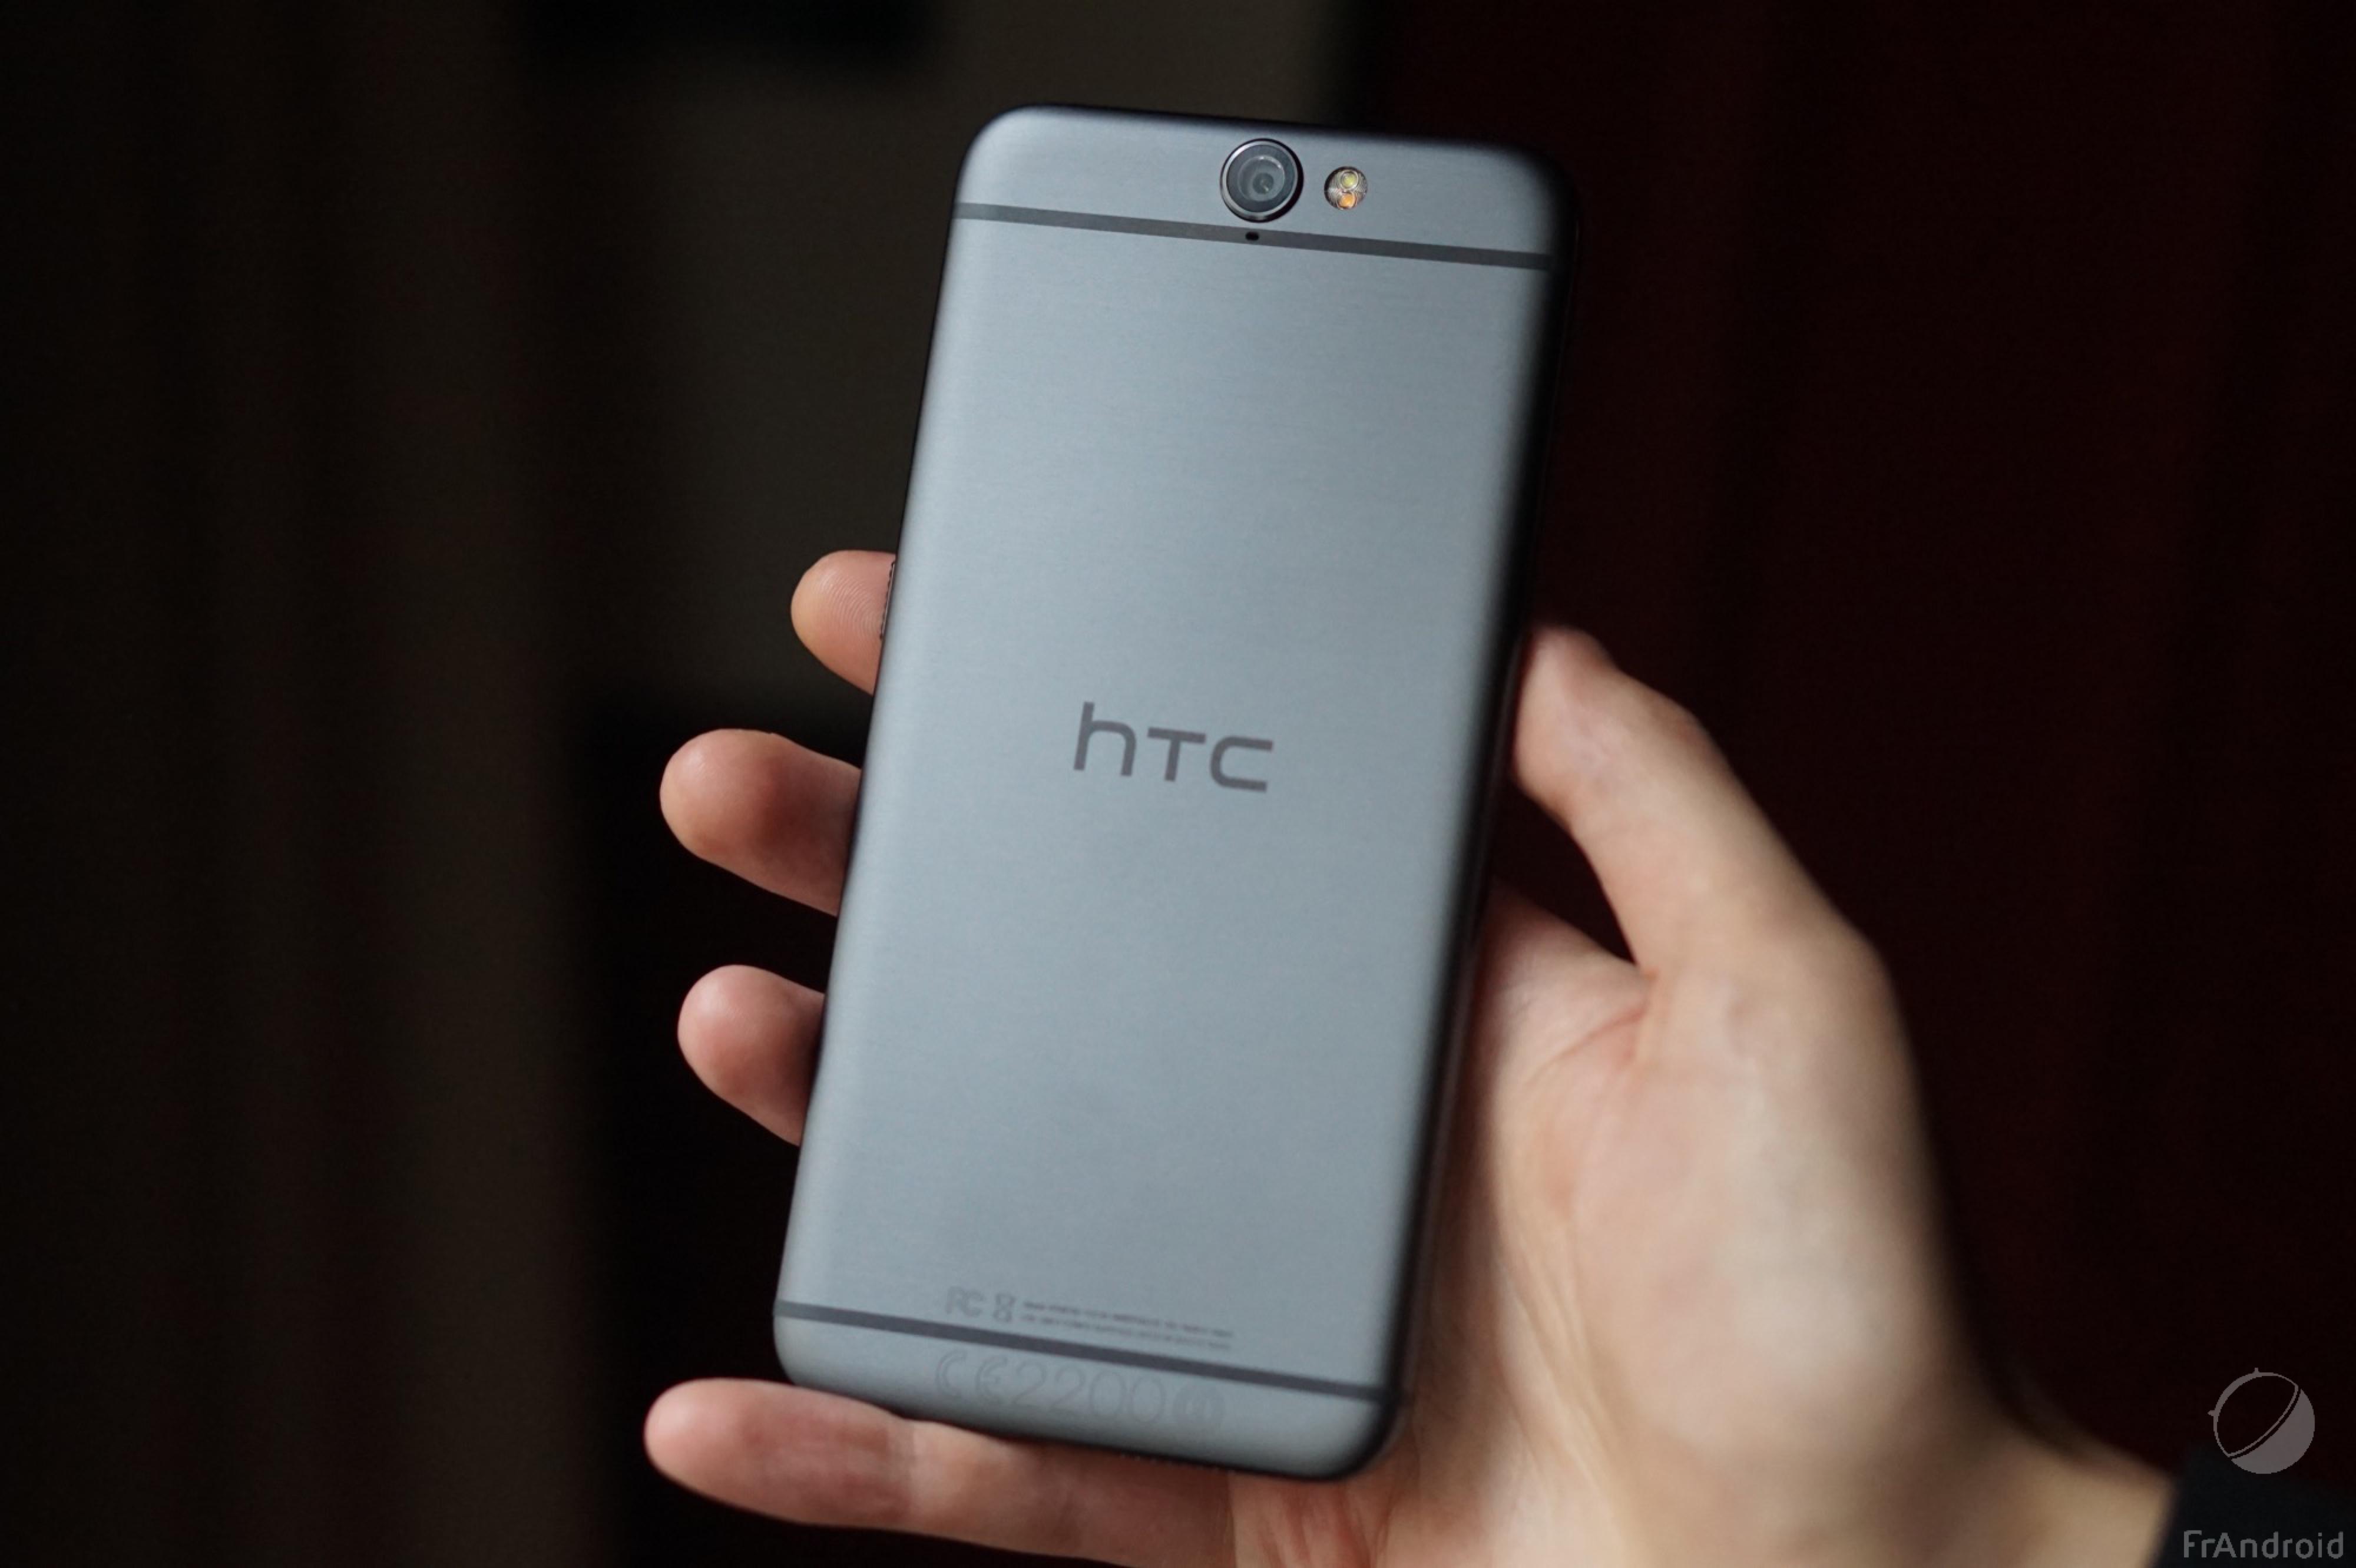 Les smartphones HTC interdits de vente en Allemagne